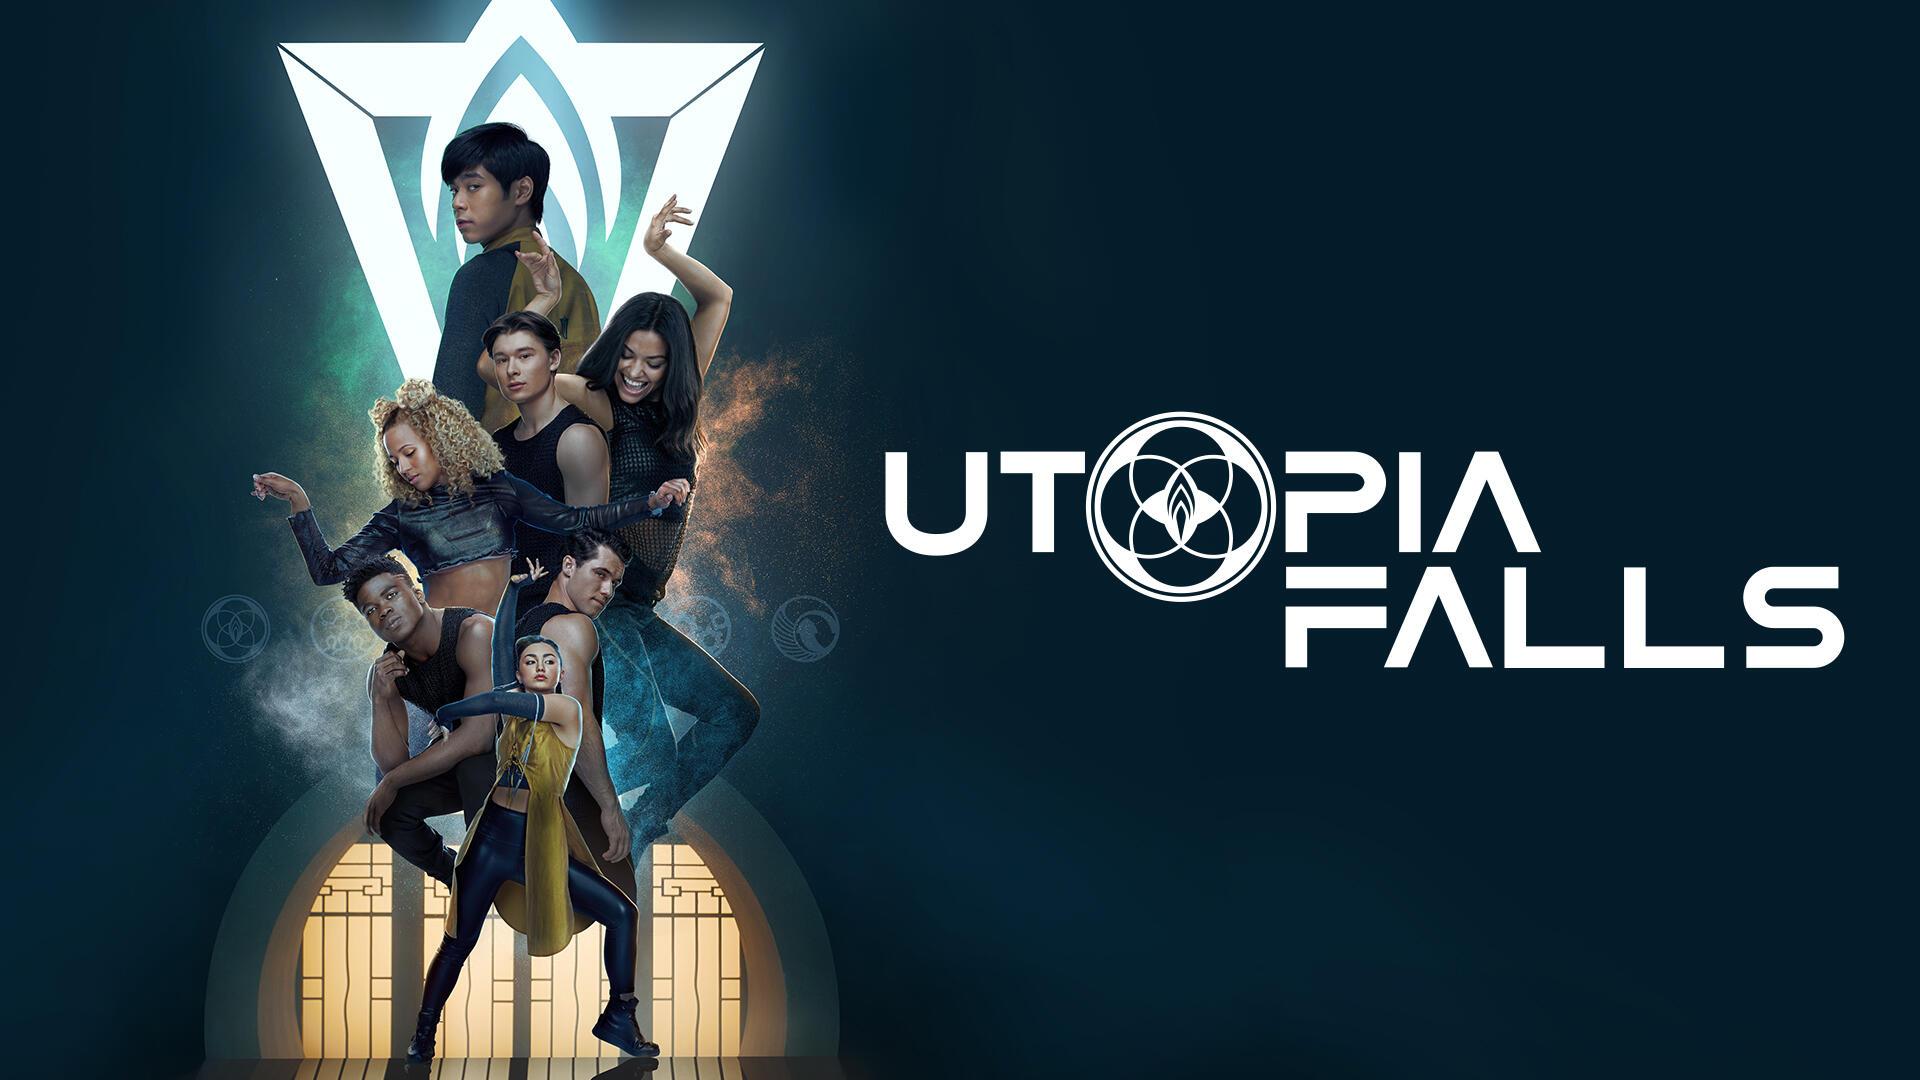 Utopia_Falls_16x9